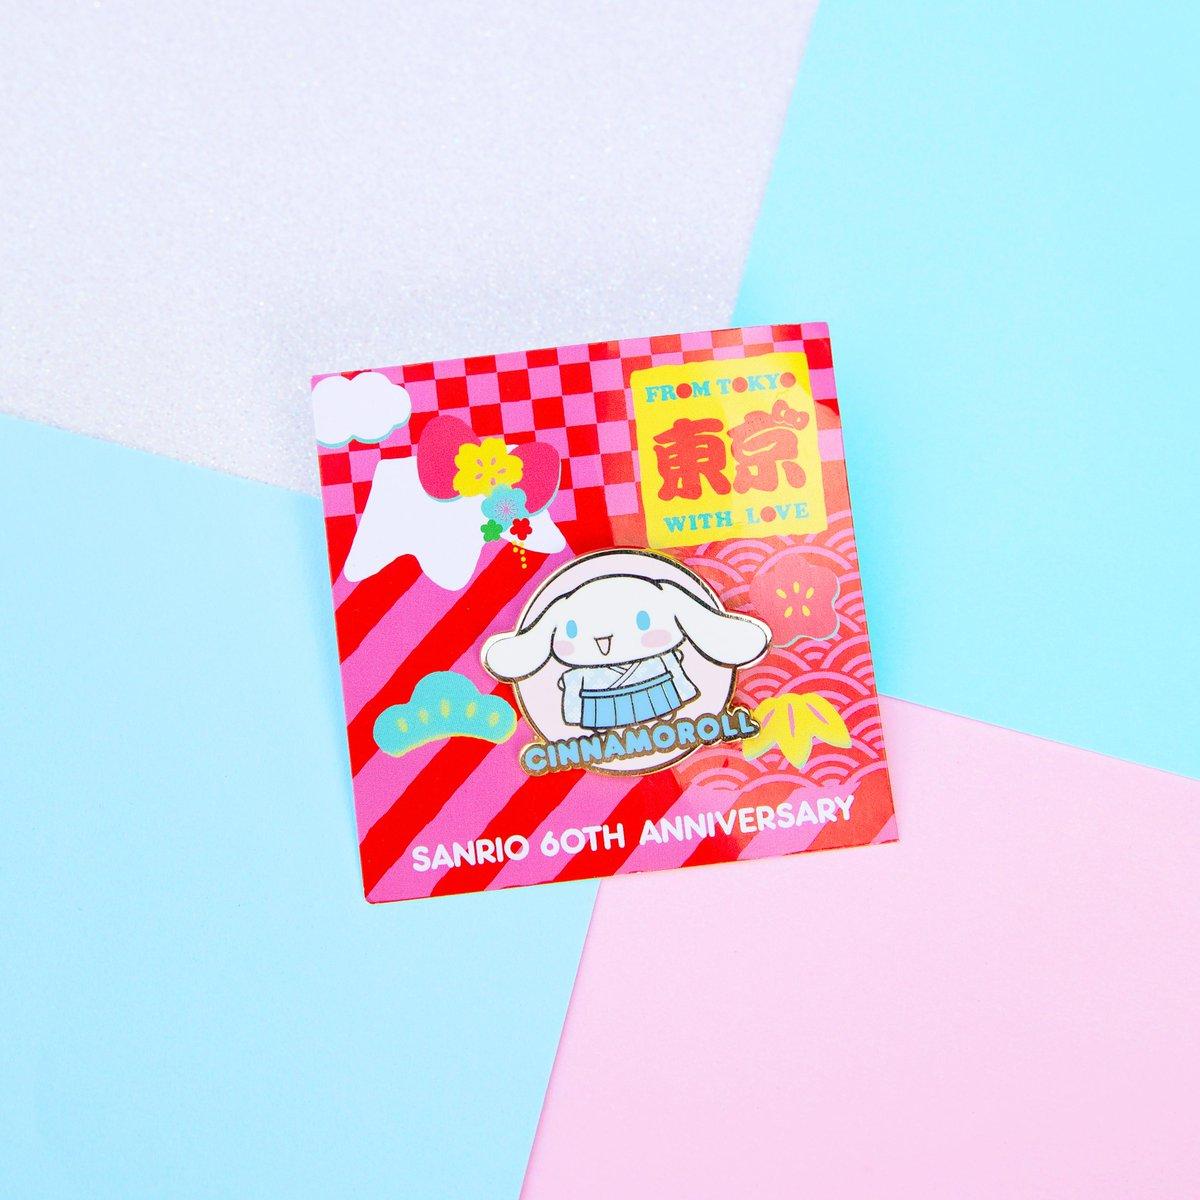 Details about  /Sanrio 60th Anniversary Cinnamoroll Cinnamonroll Friend Of The Month Pin